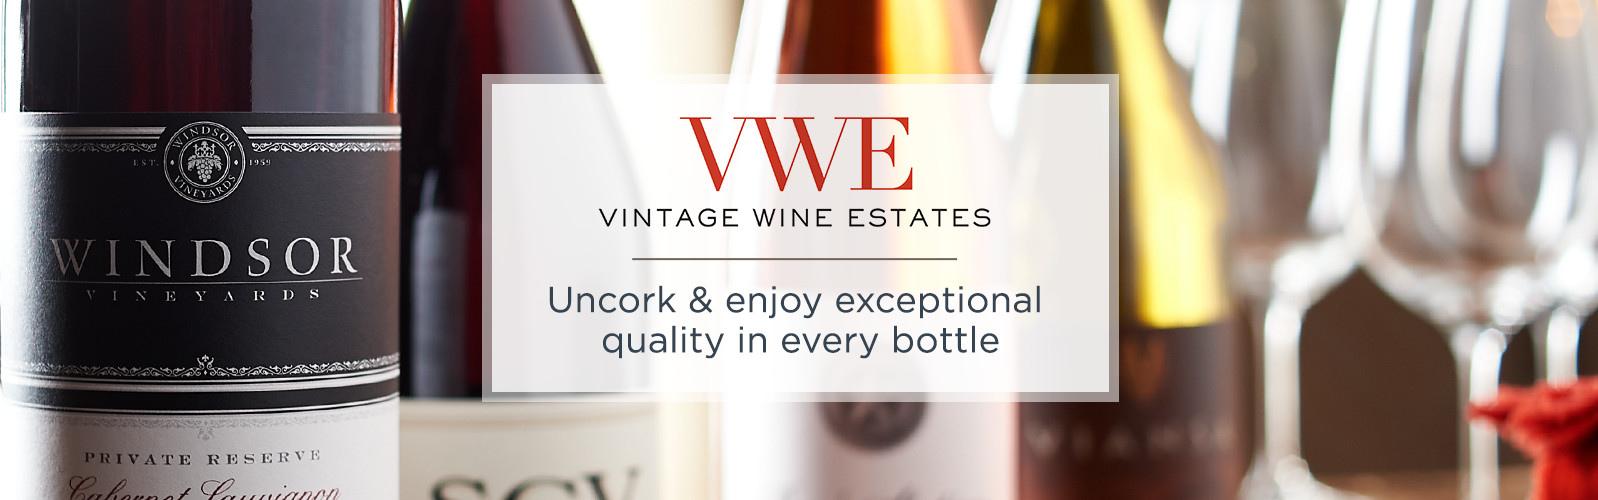 Vintage Wine Estates.  Uncork & enjoy exceptional quality in every bottle.